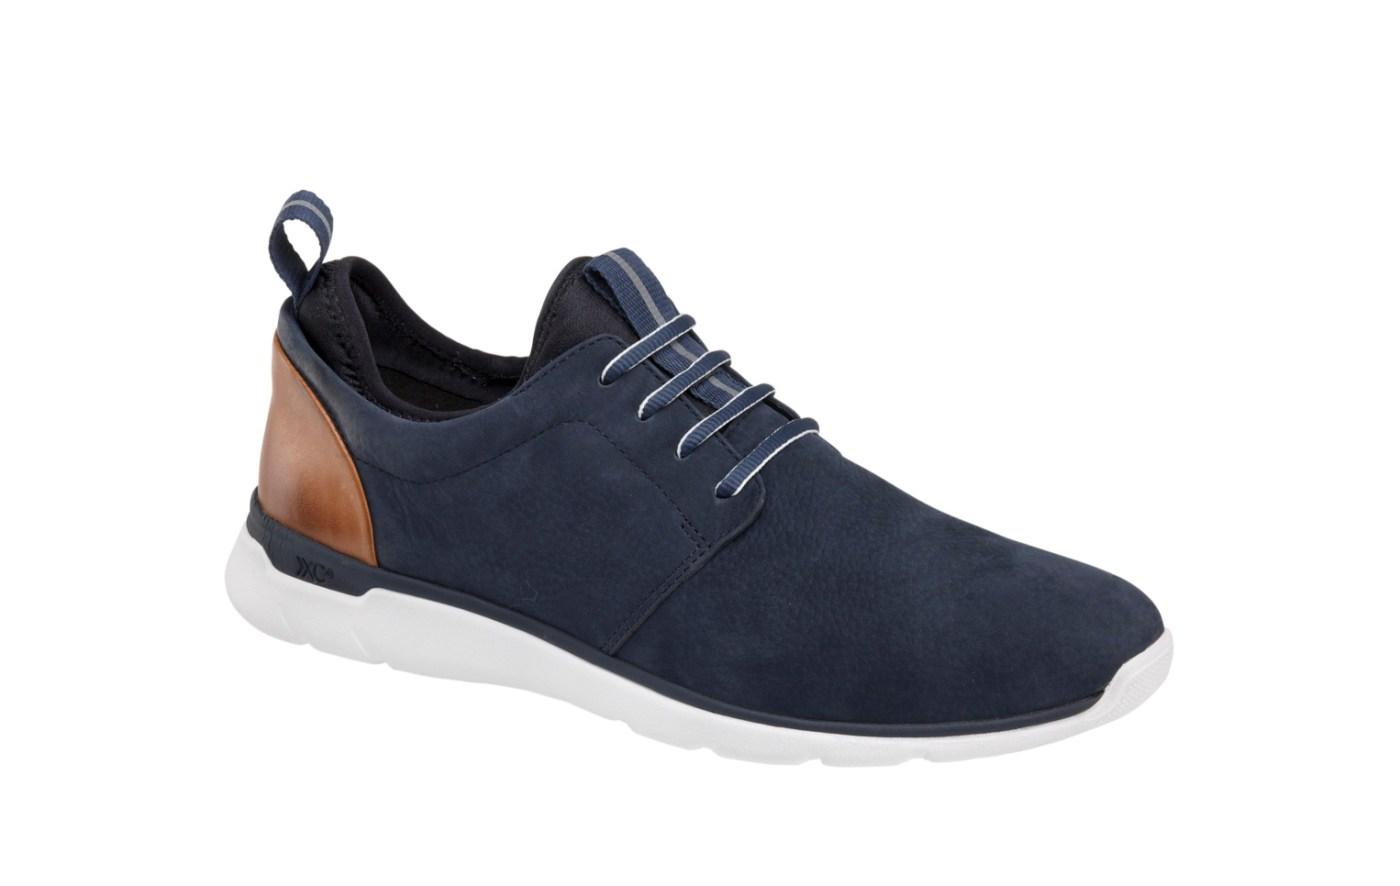 Johnston and Murphy XC4 Prentiss Plain Toe weatheproof shoes